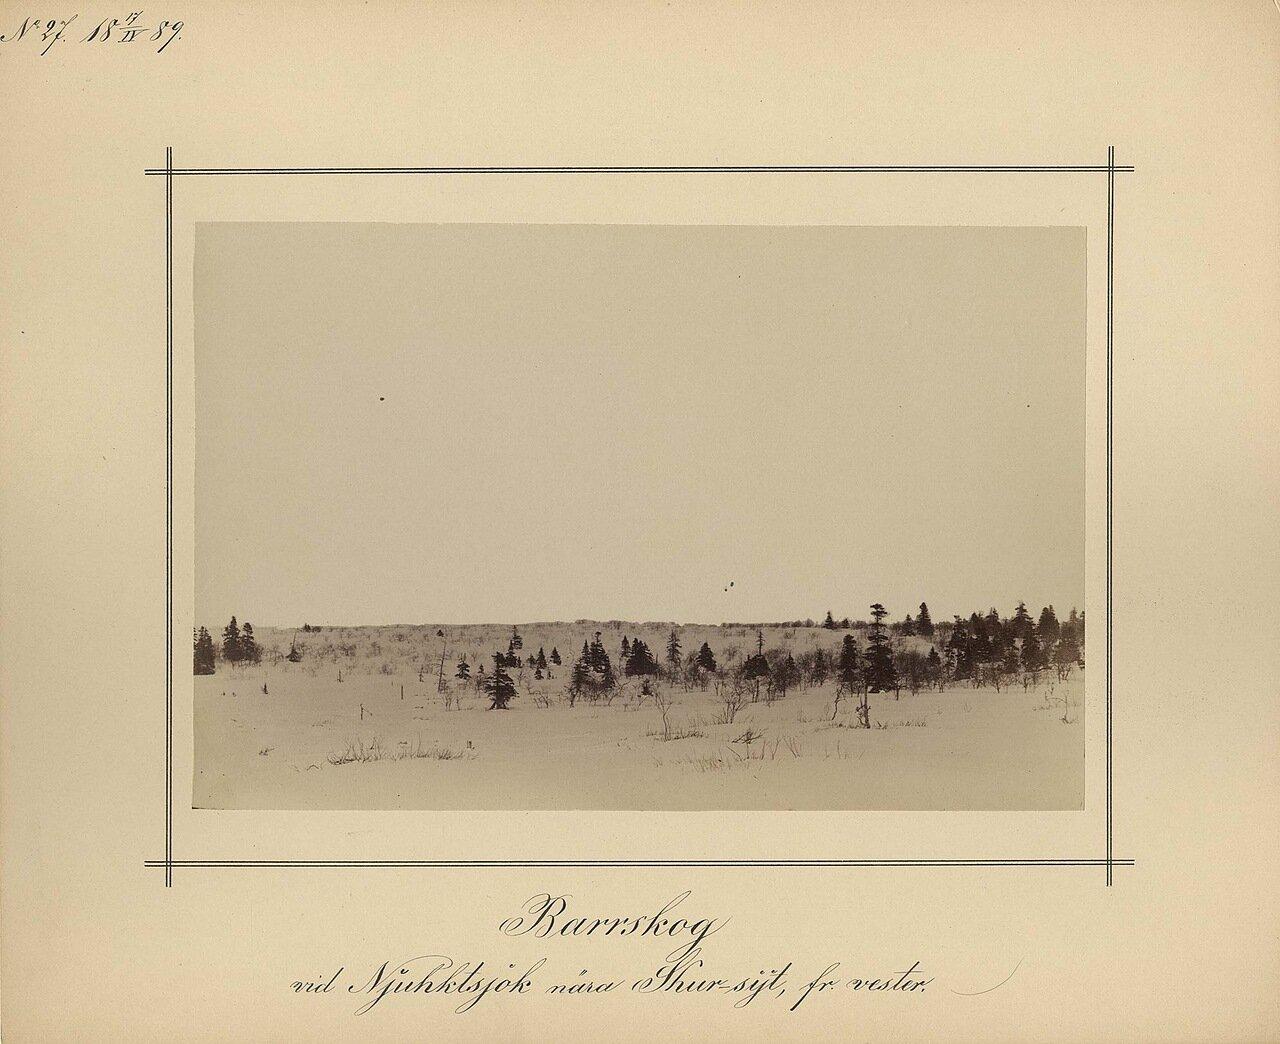 17.4.1889. Хвойный лес, недалеко от деревни на реке Njuhkts